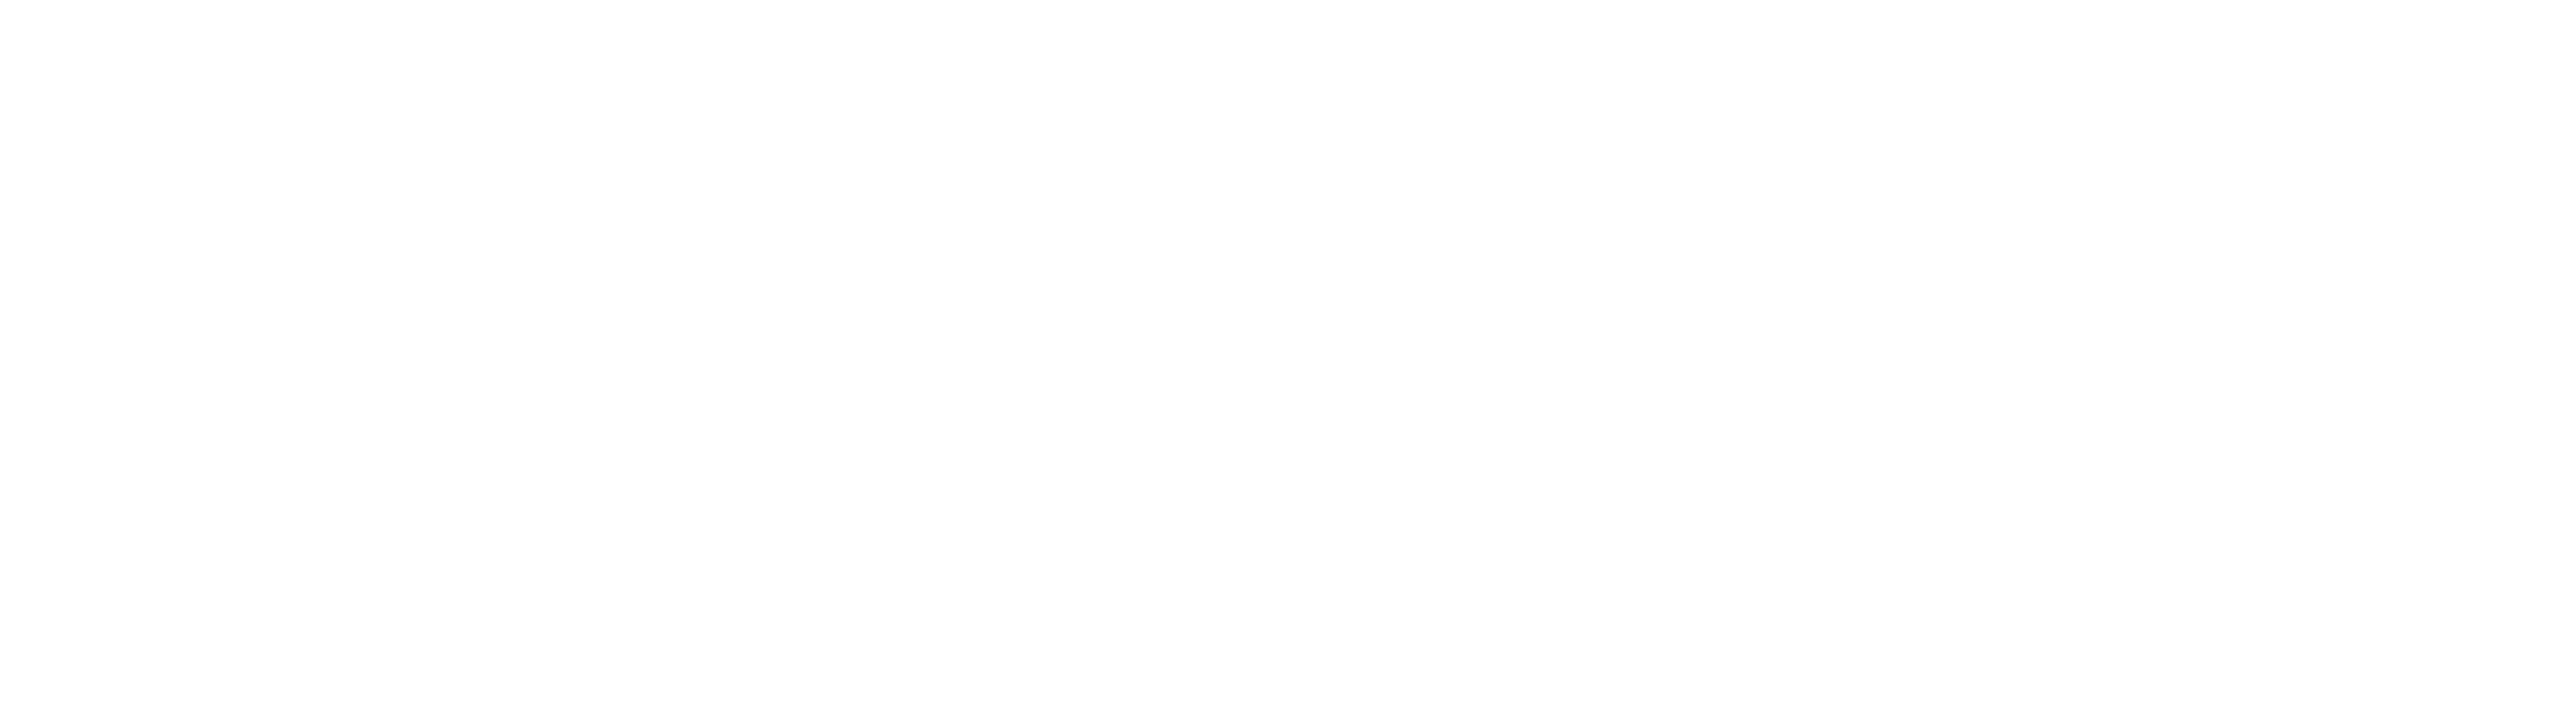 logo GCIC blanco